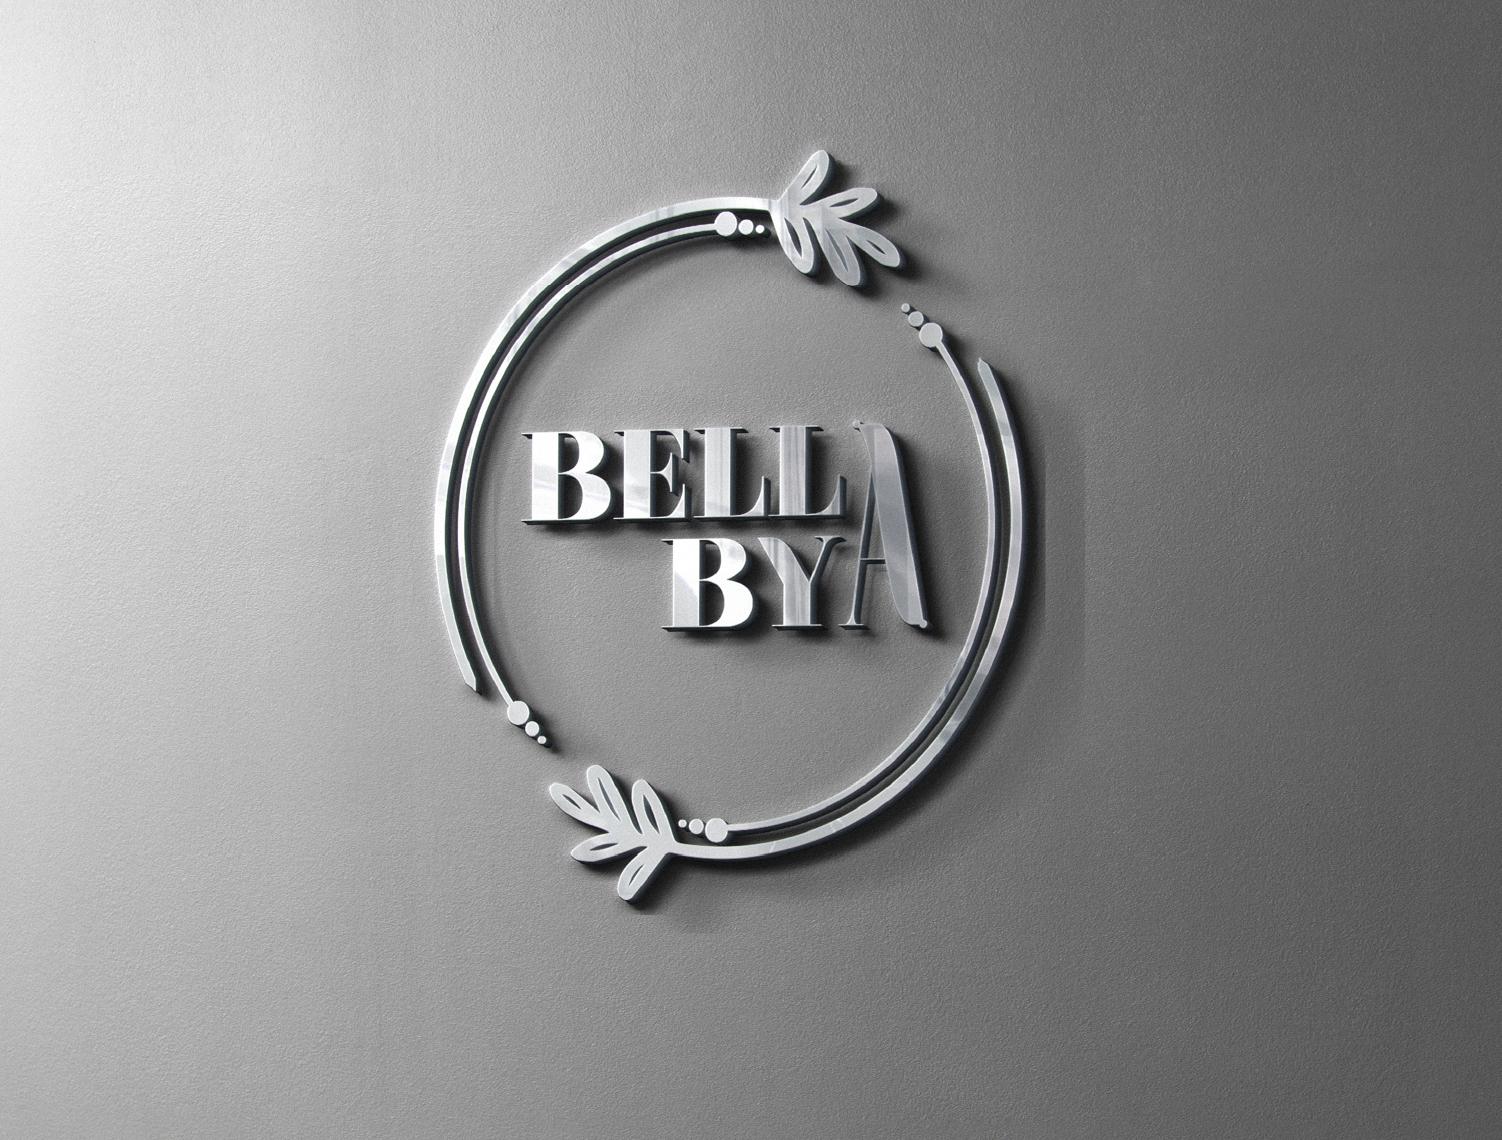 BELLABYA